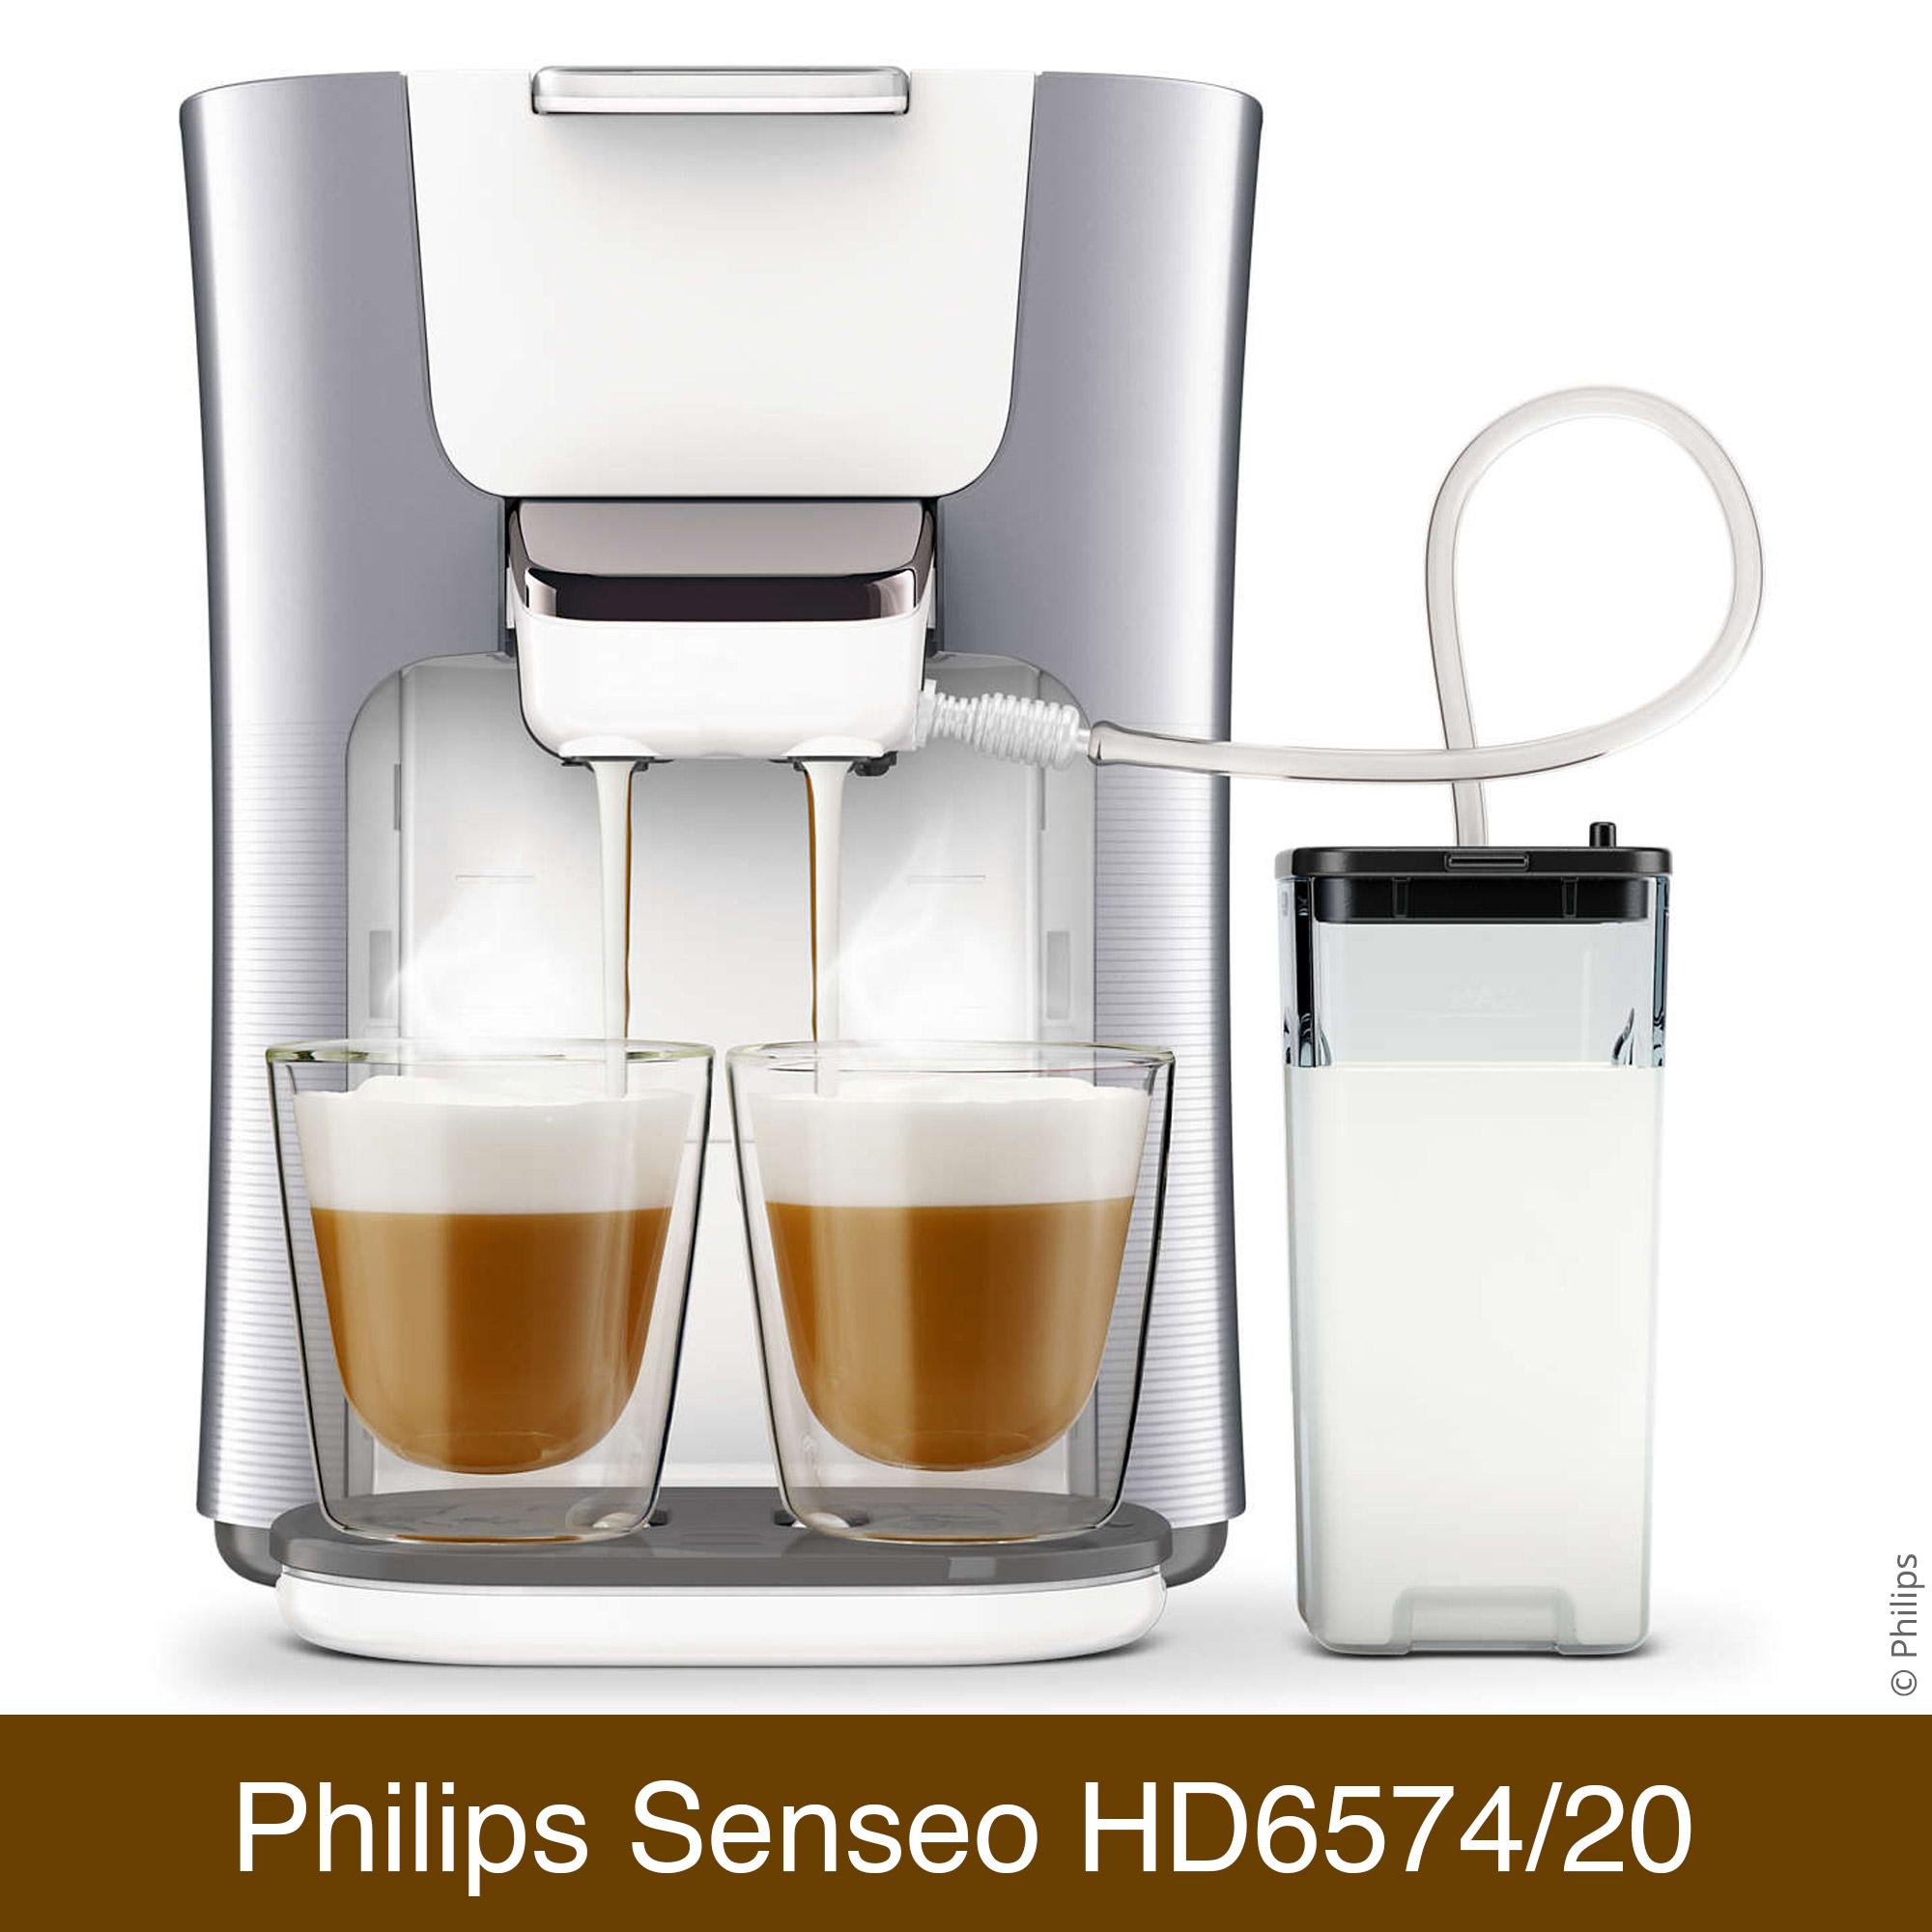 Philips Senseo HD6574/20 Latte Duo Vergleich